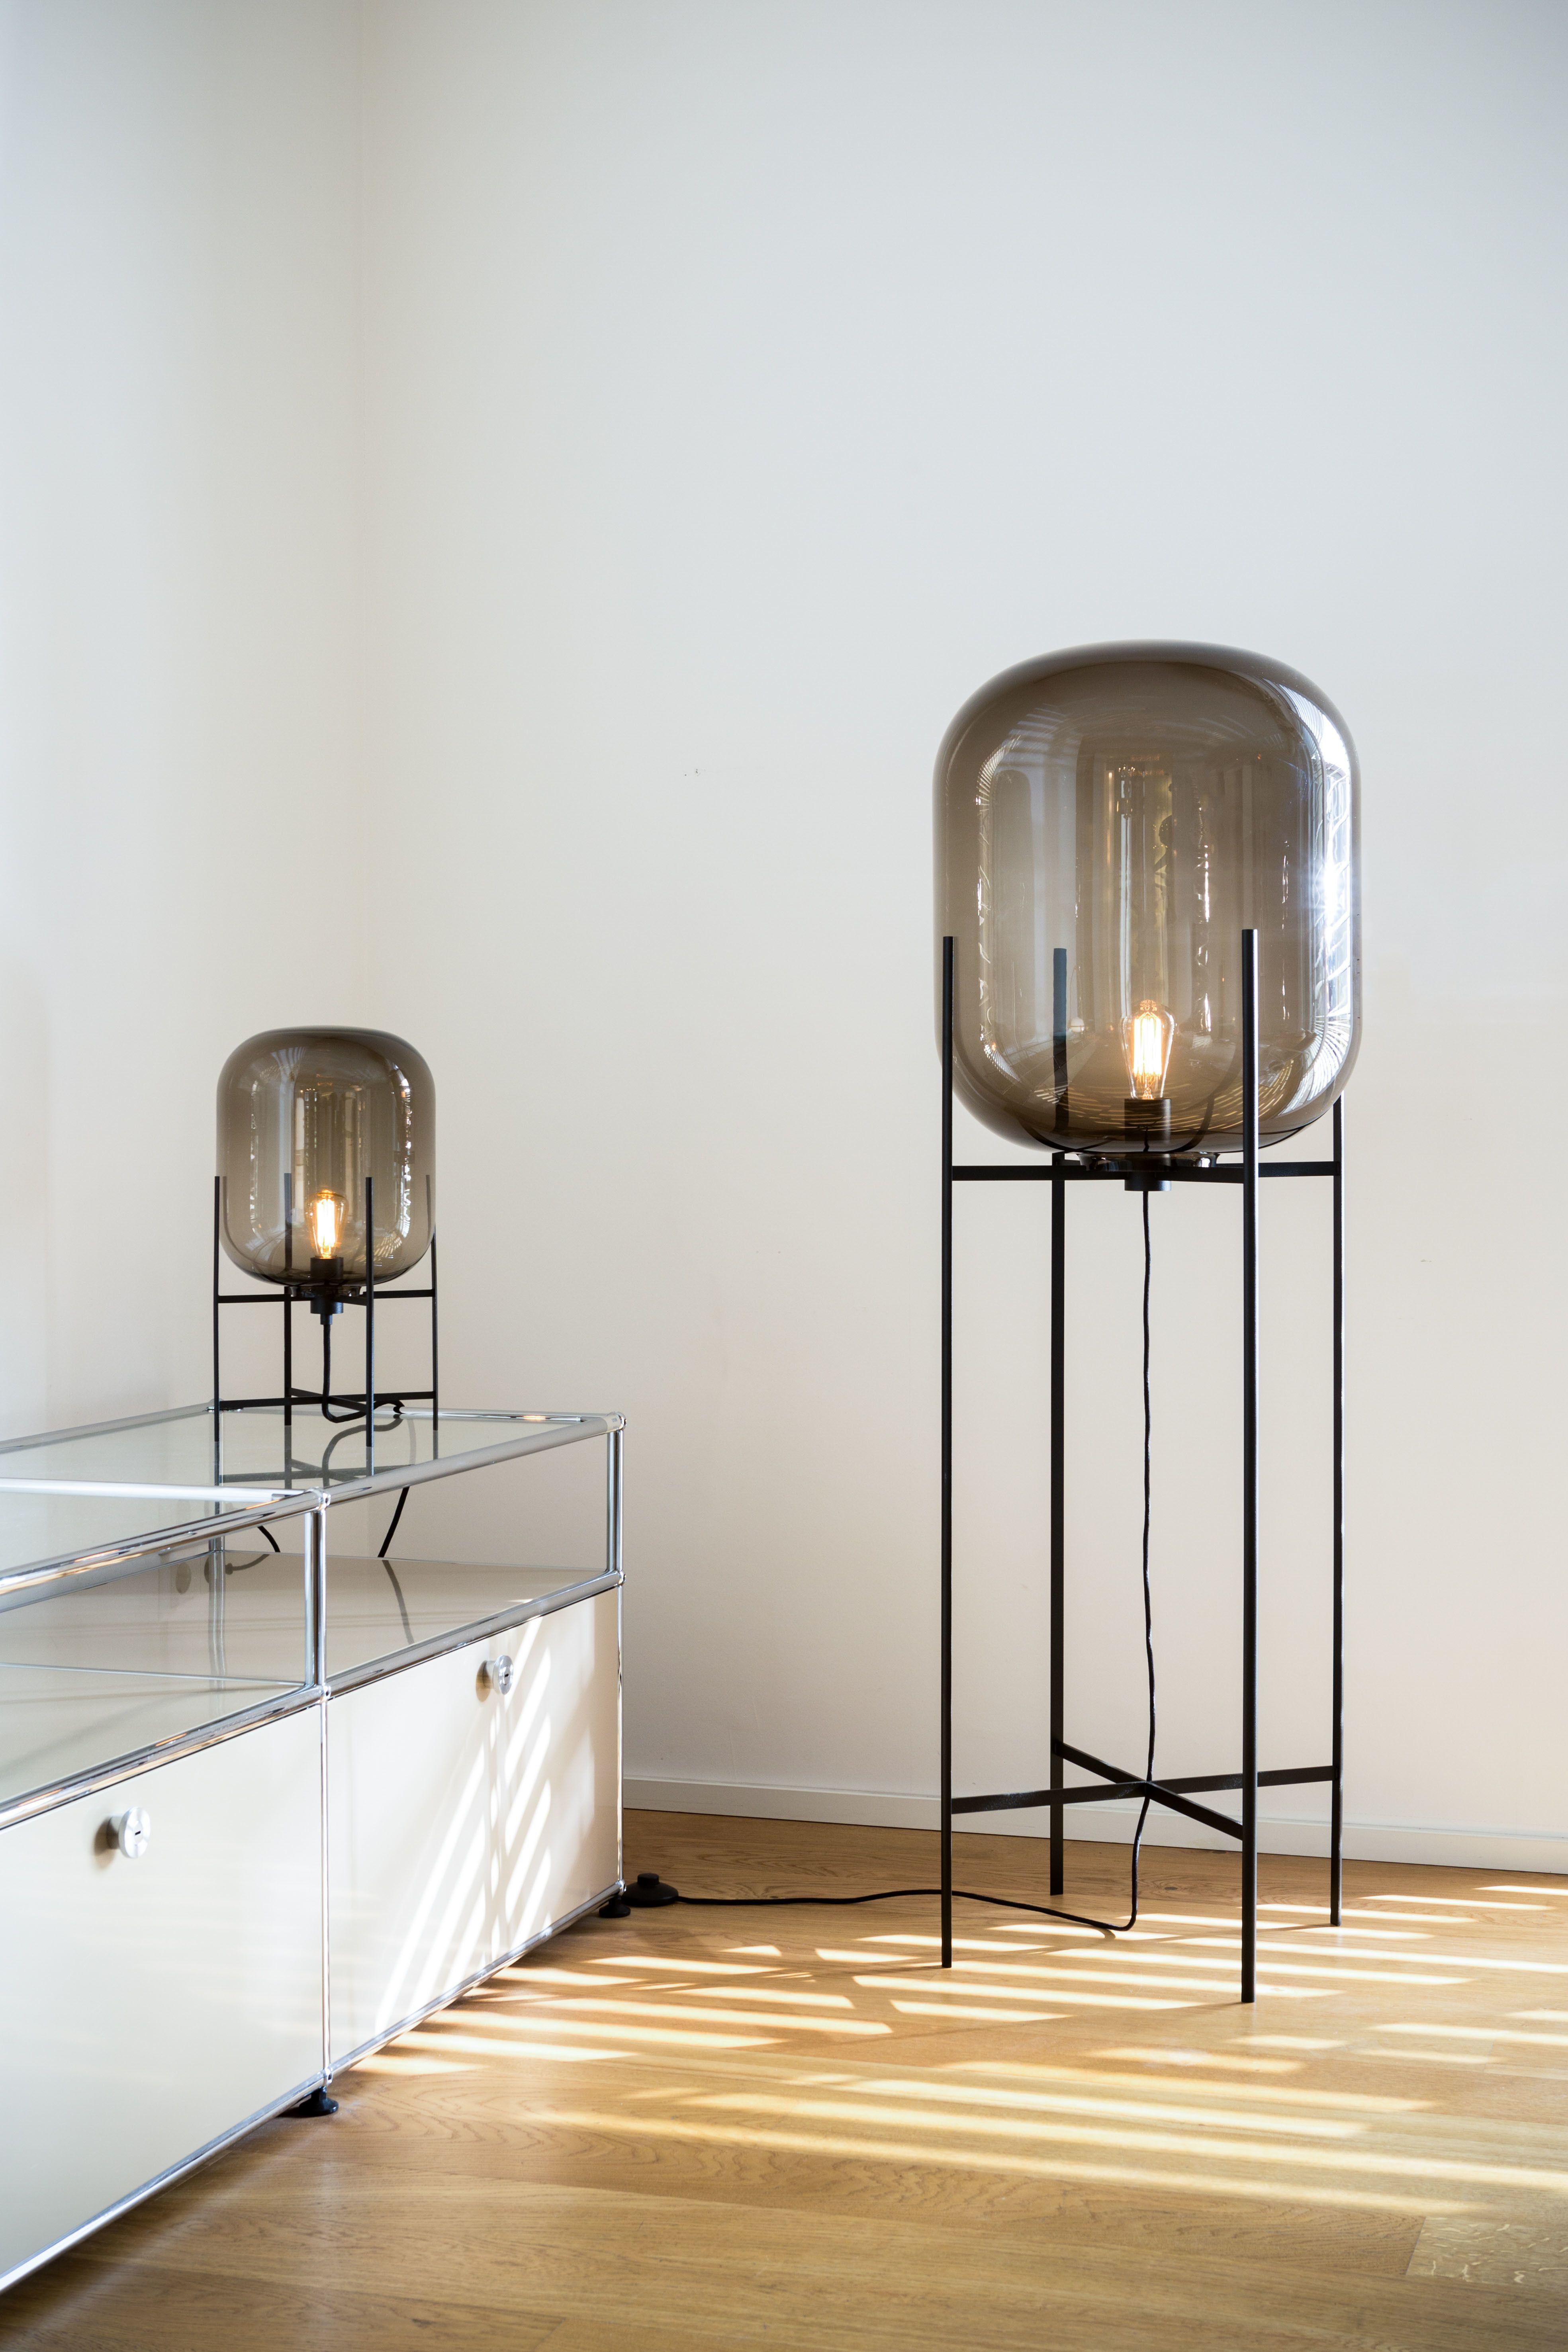 Table Lamp Oda Small By Sebastian Herkner For Pulpo Materials Colors Smoky Grey Glass Black Powder Coated Vloerlamp Woonkamerlampen Binnenverlichting